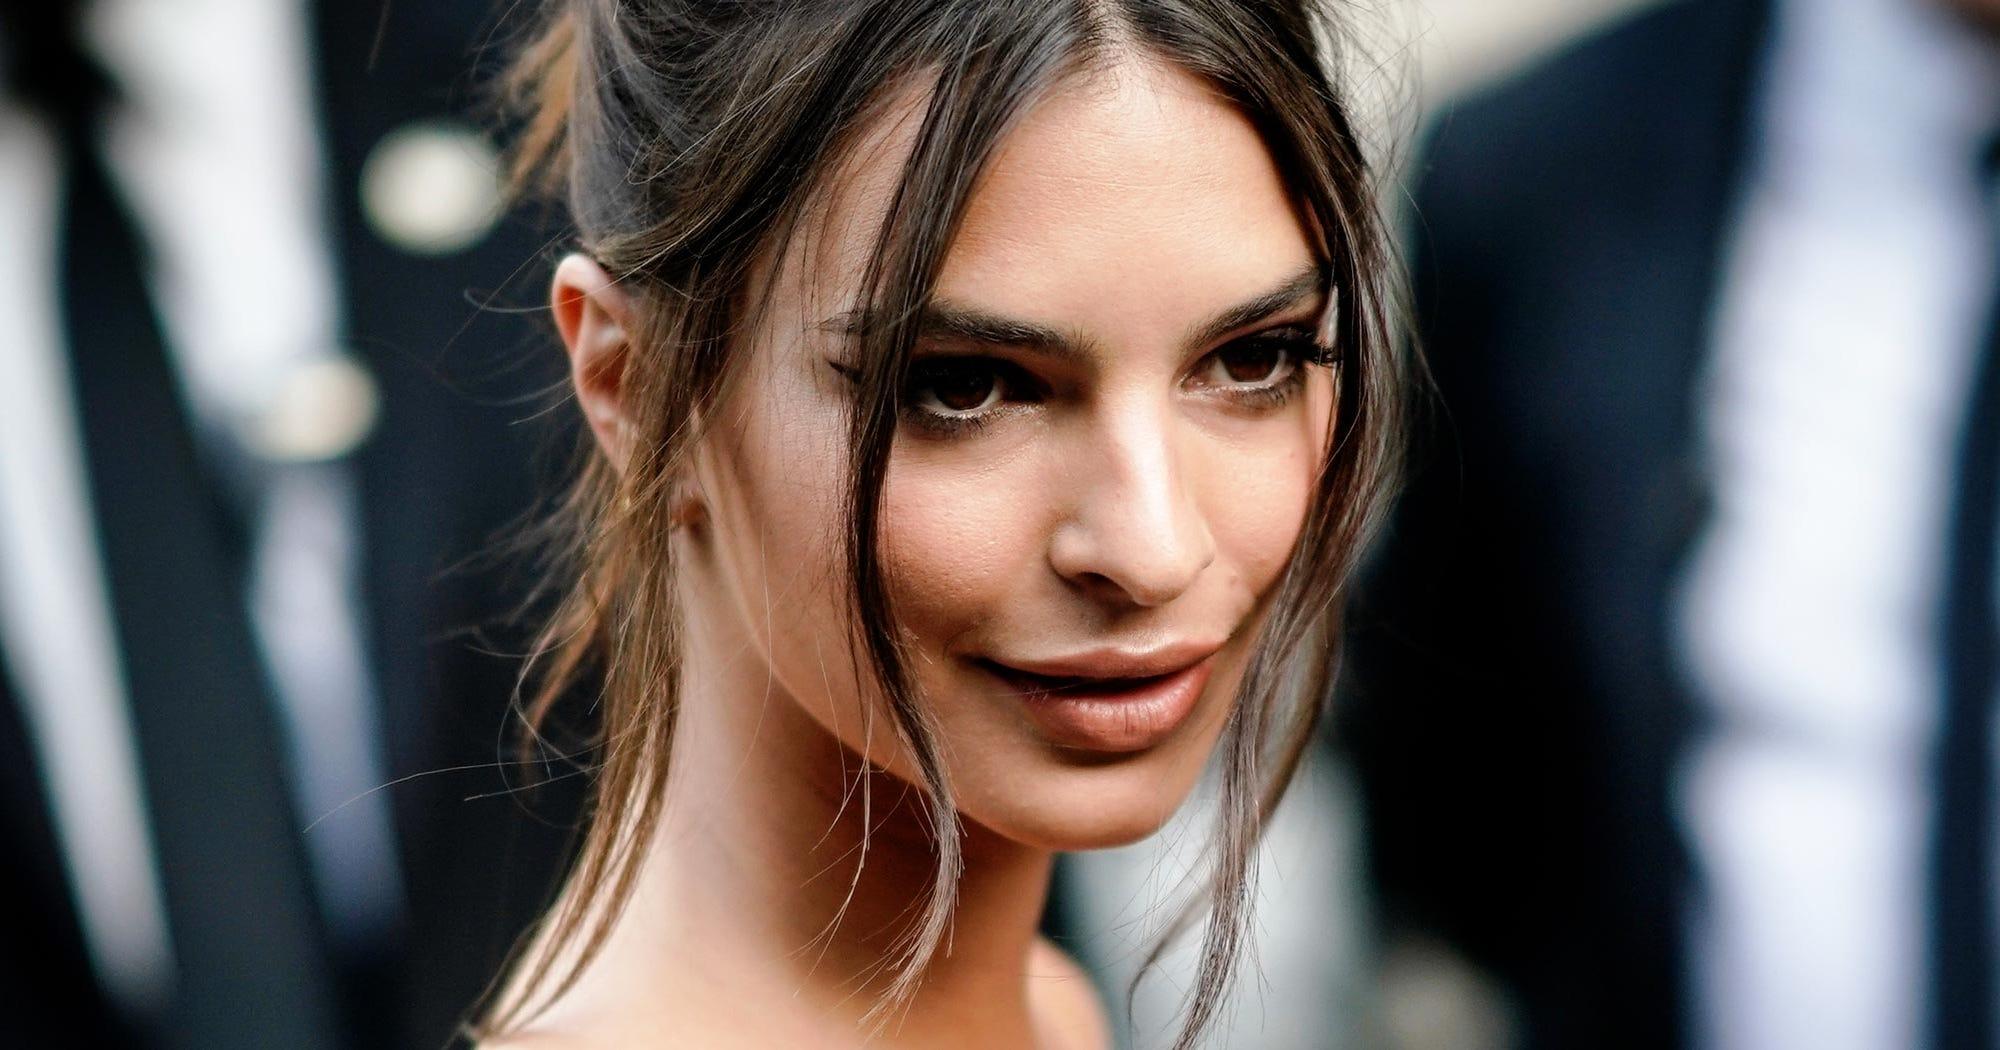 Most Popular Instagram Stories Models Emily Ratajkowski